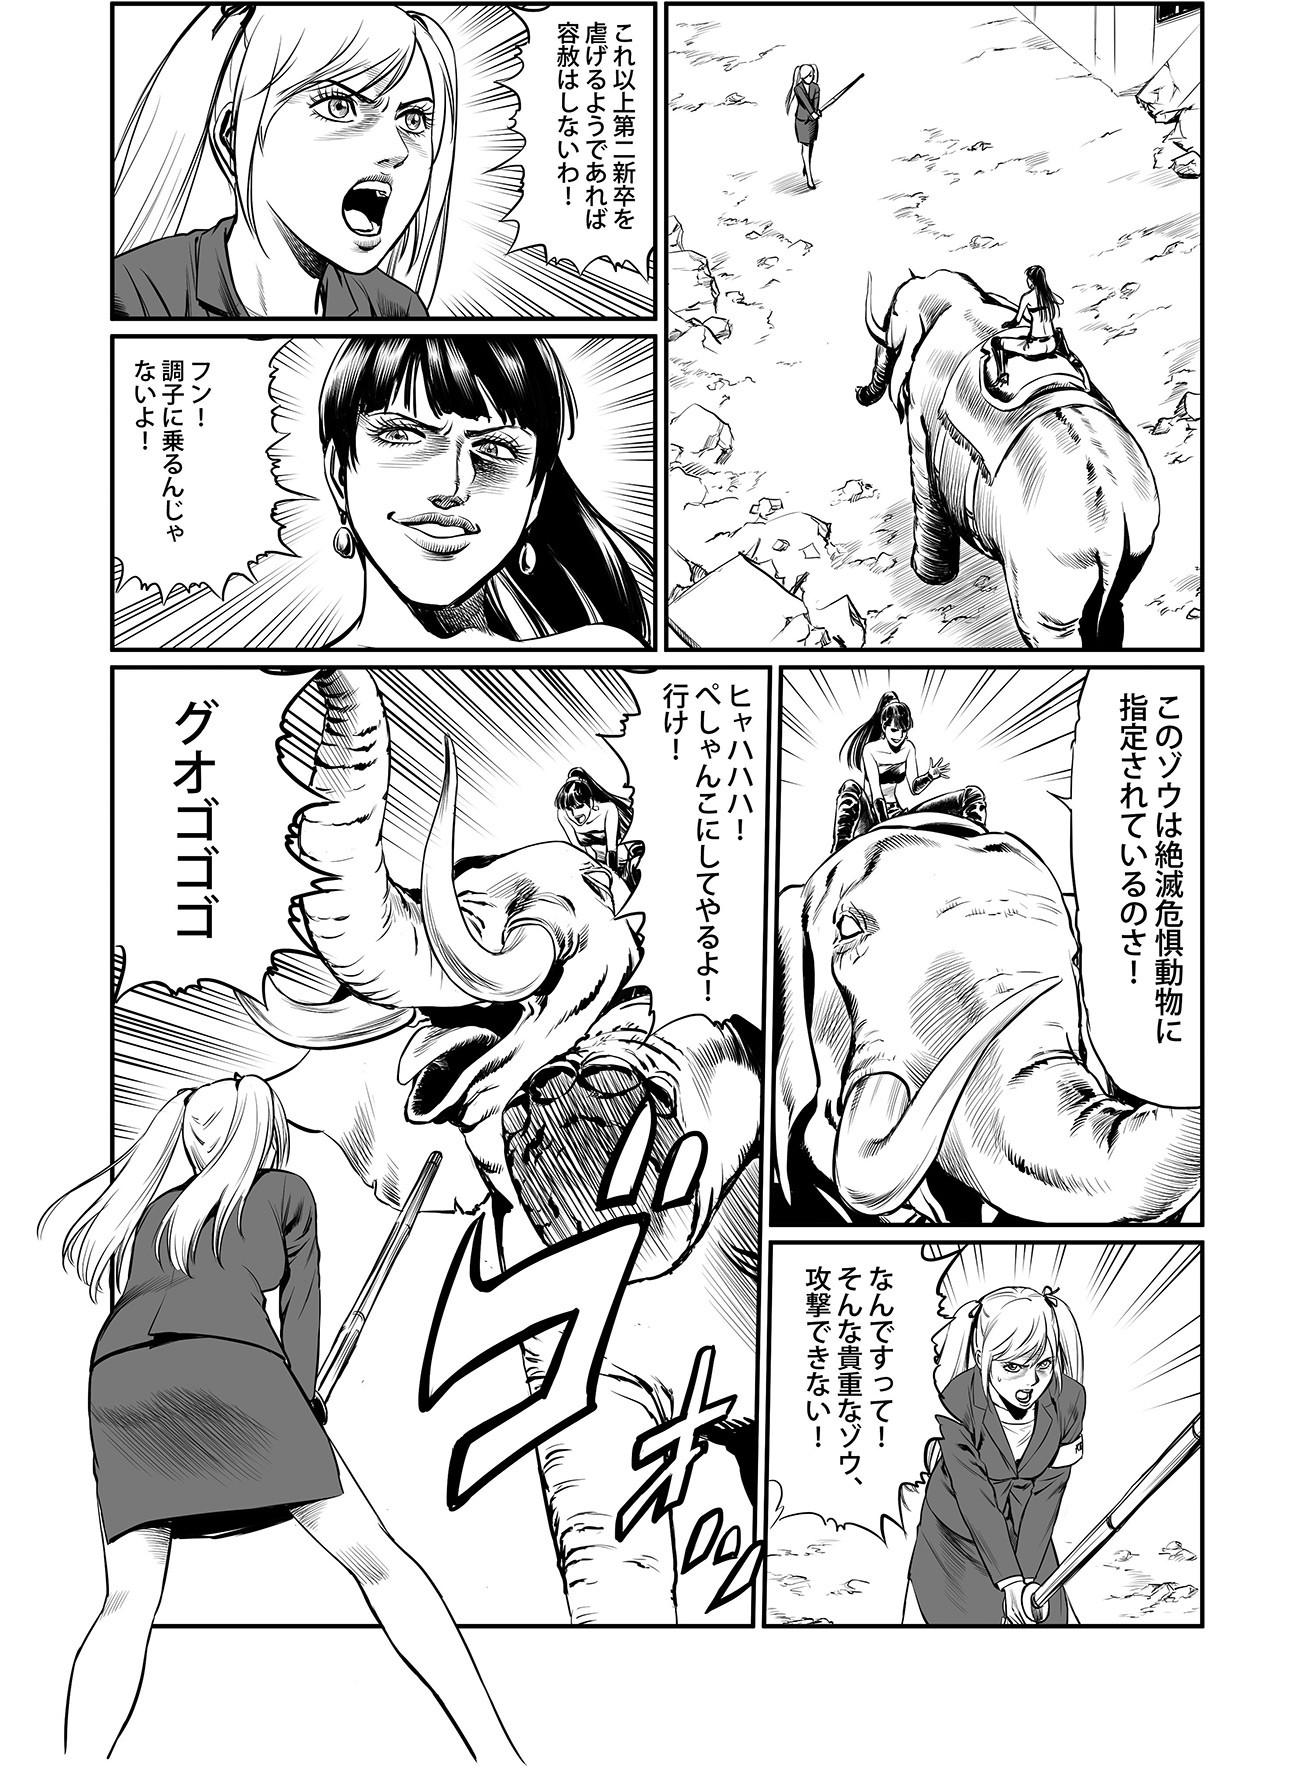 gakujo07_1310